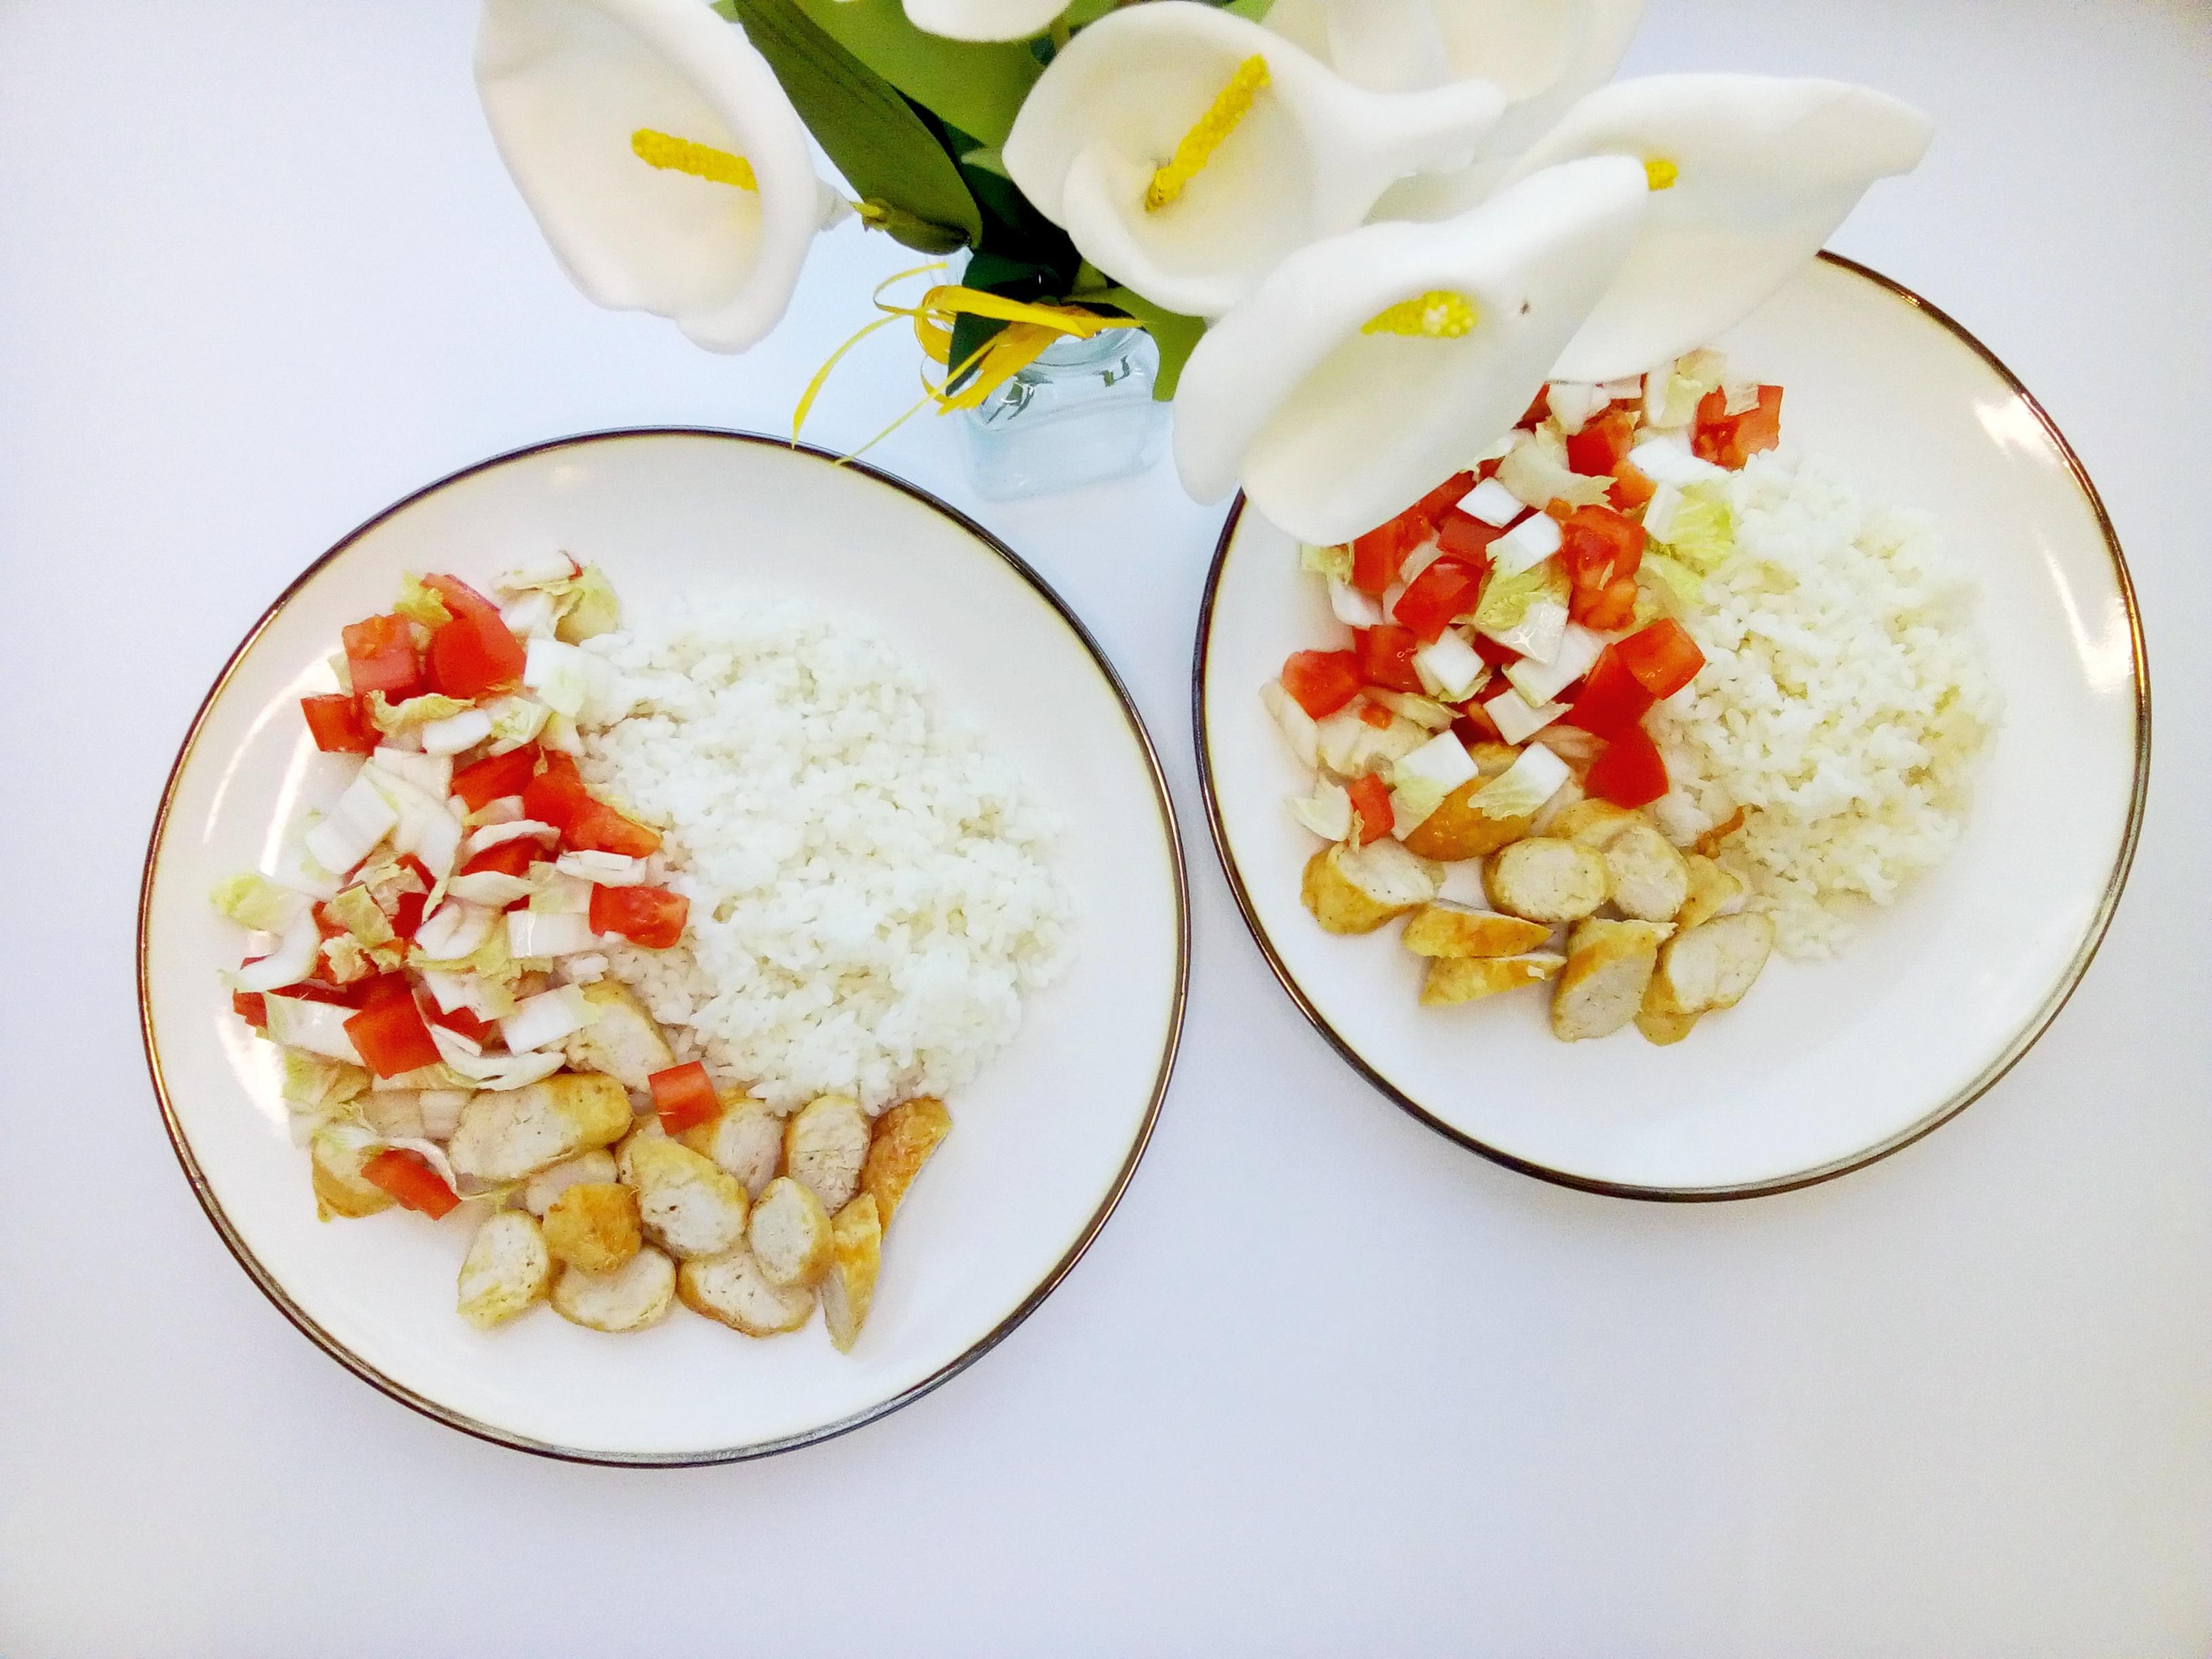 колбаски с рисом и салатом из пекинки с помидорами